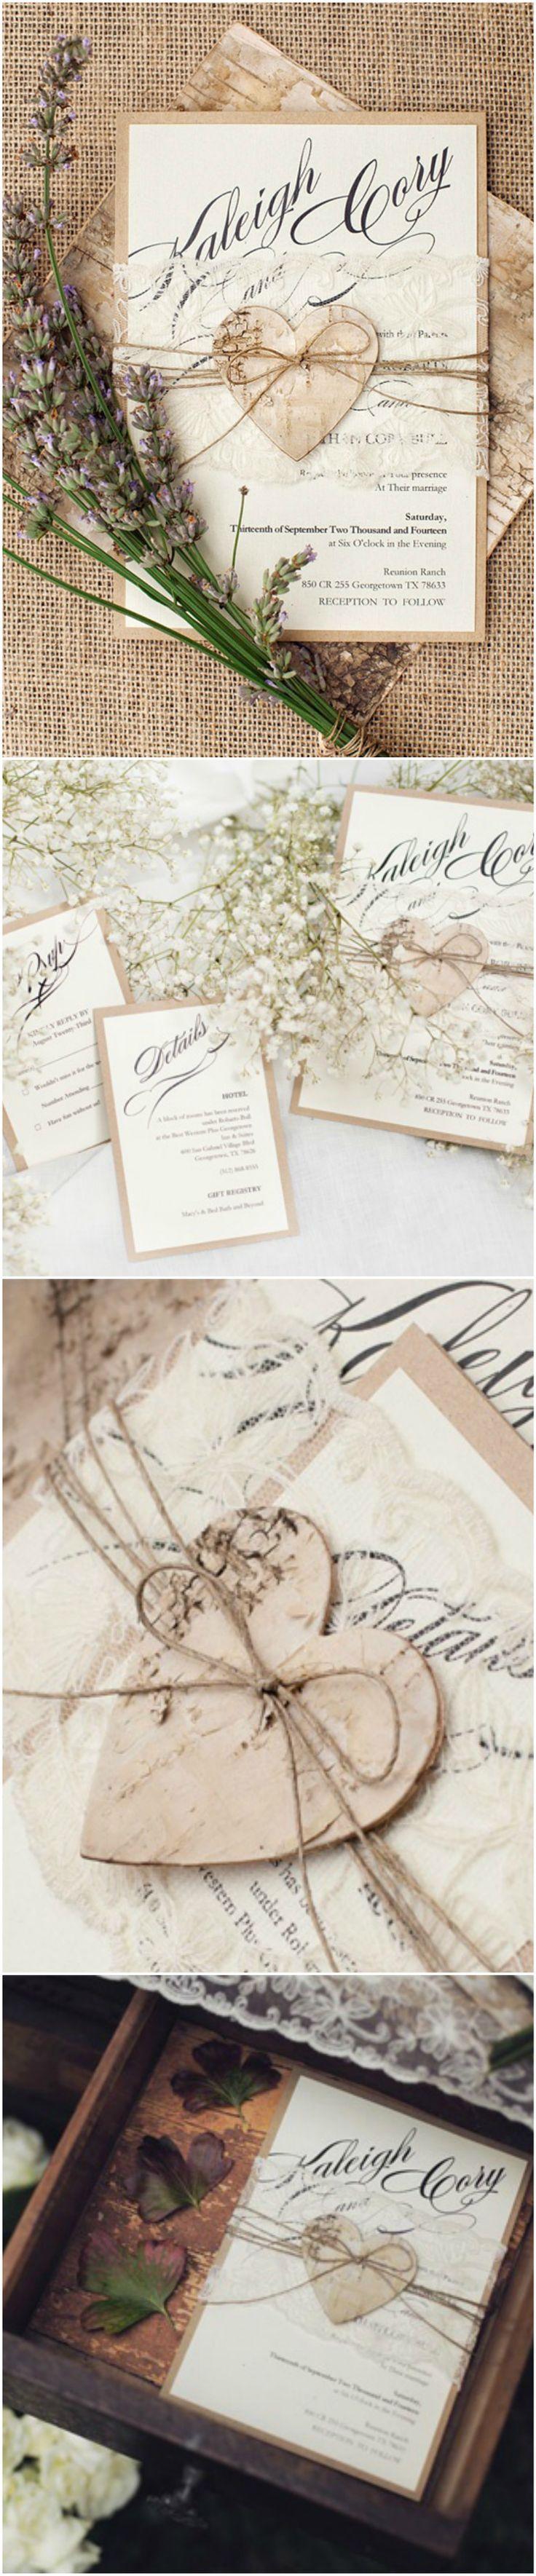 Romantic Rustic Lace Wedding Invitation with wooden birch bark heart tag #romantic #rustic #eco #kraftpaper #weddingideas #weddingplanning #invitations #handmade